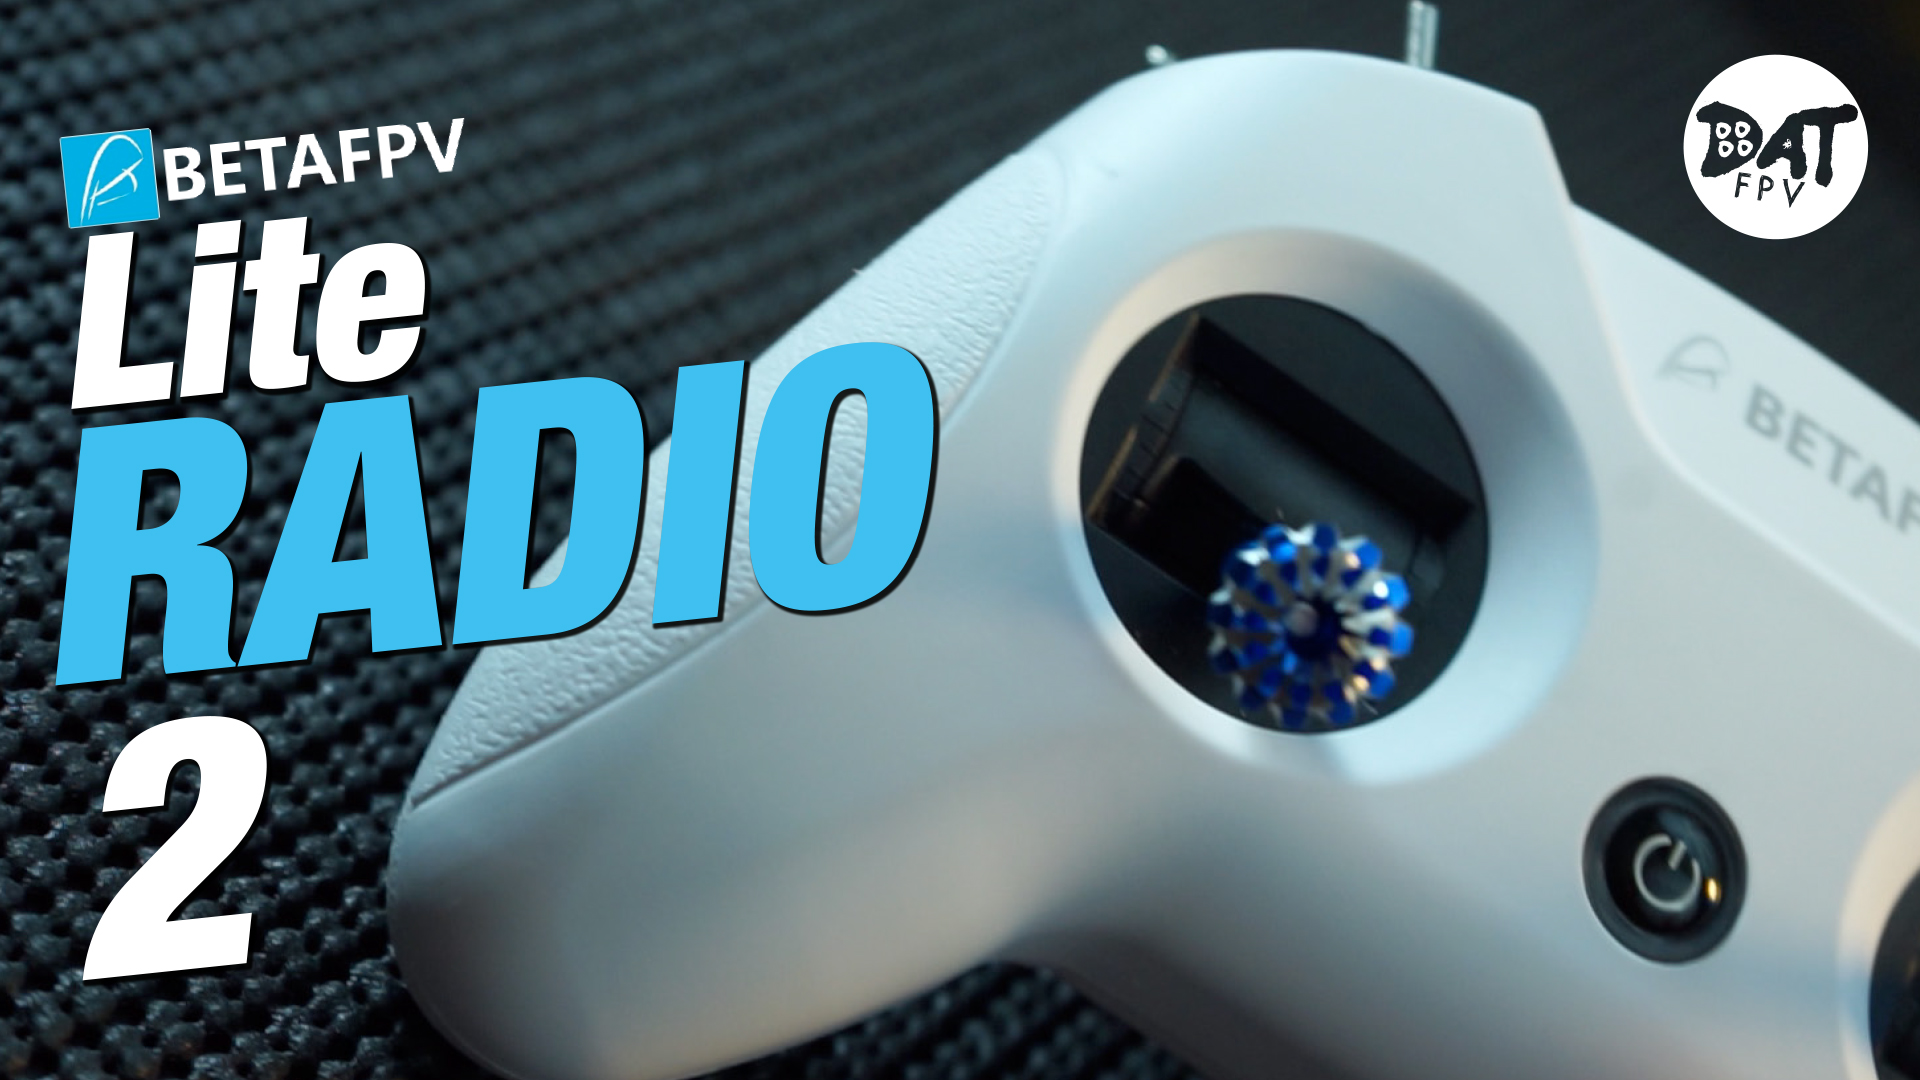 Betafpv Lite Radio 2 Instructions